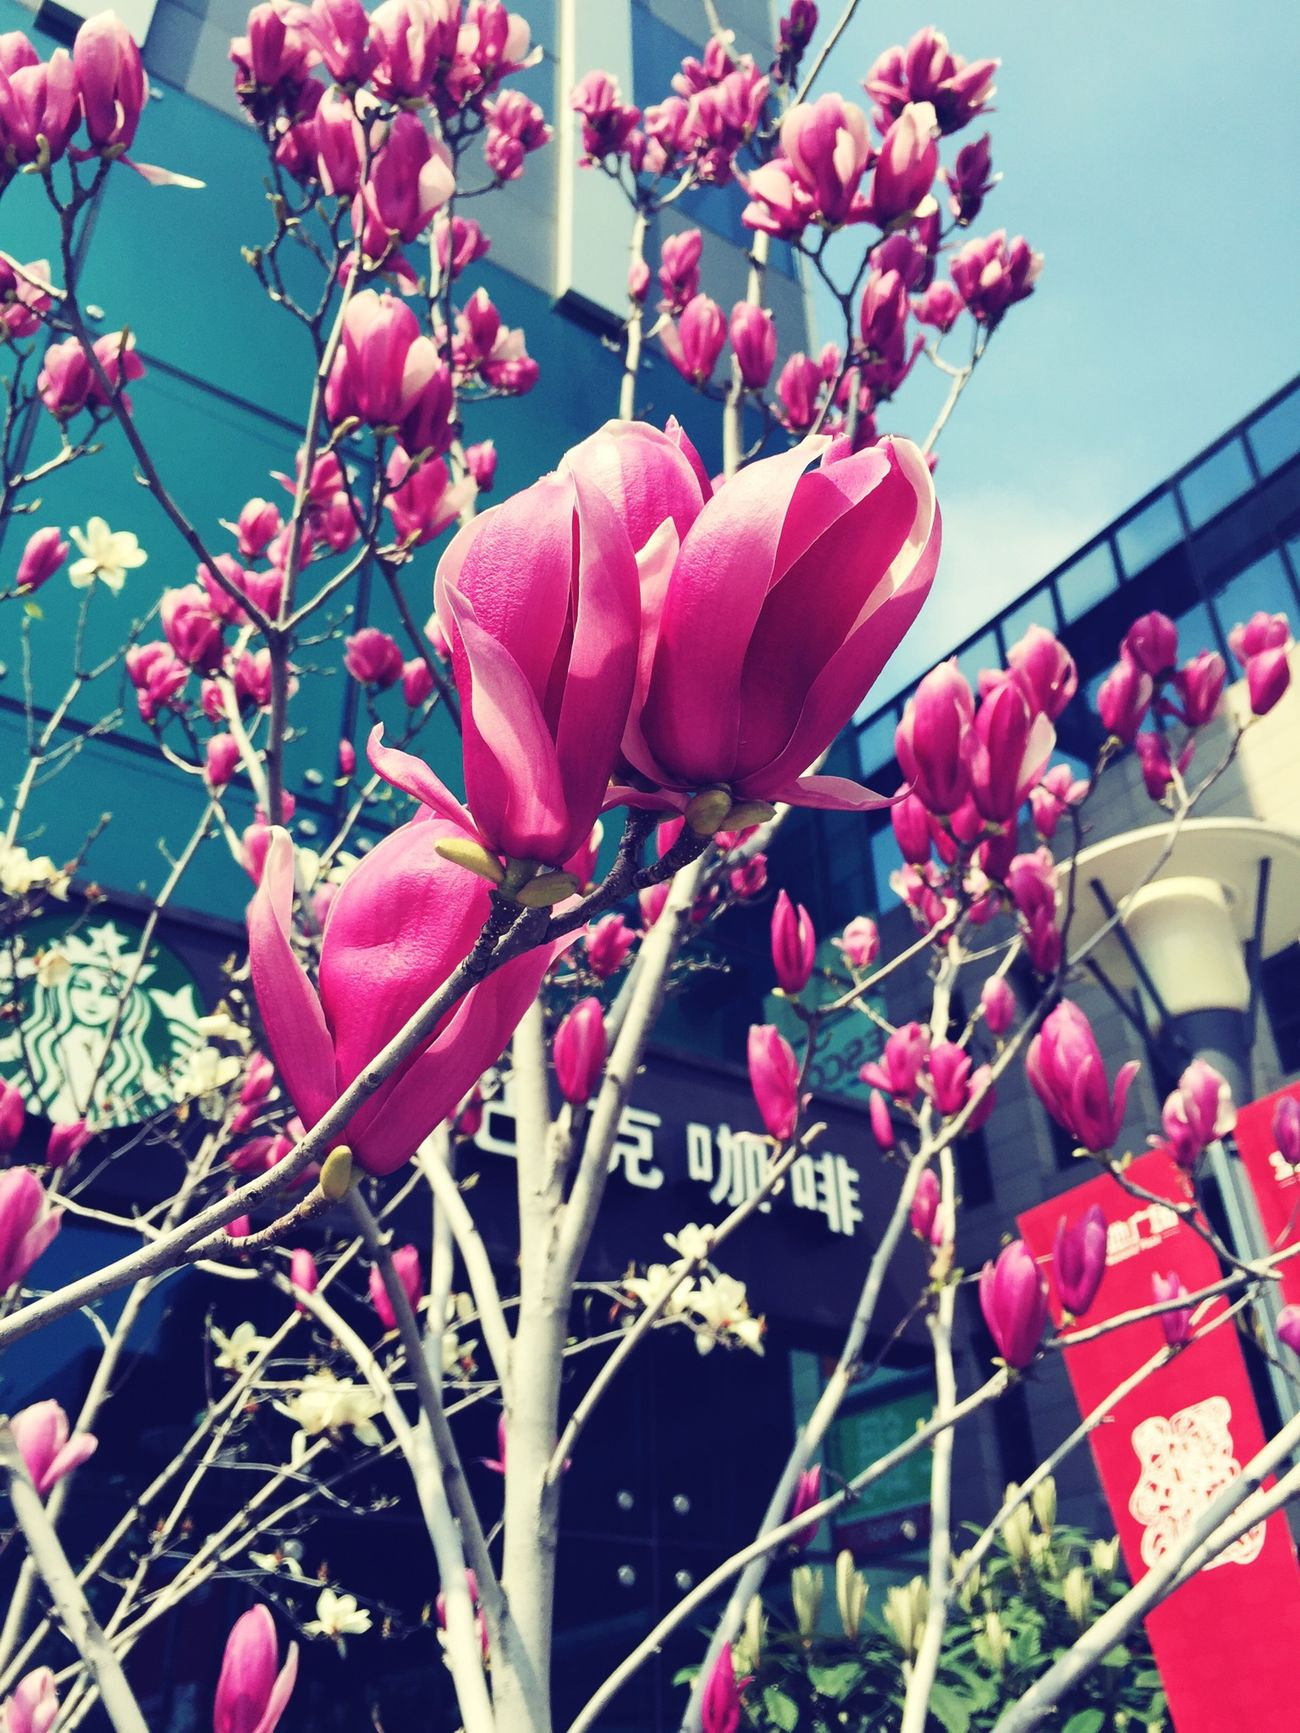 白玉兰 花朵